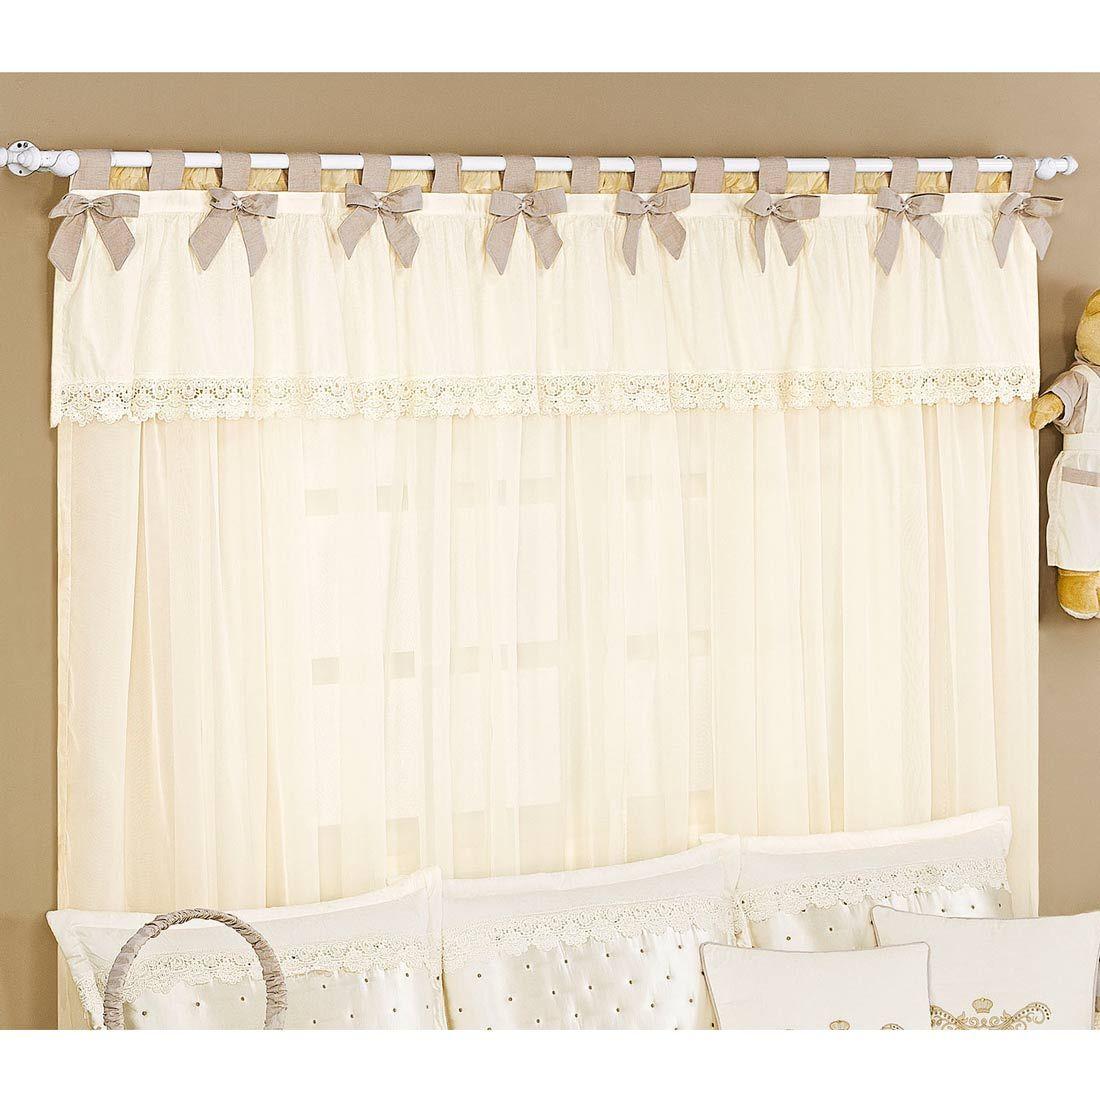 cortina para varo simples com metros quarto enxoval para beb imperial palhau